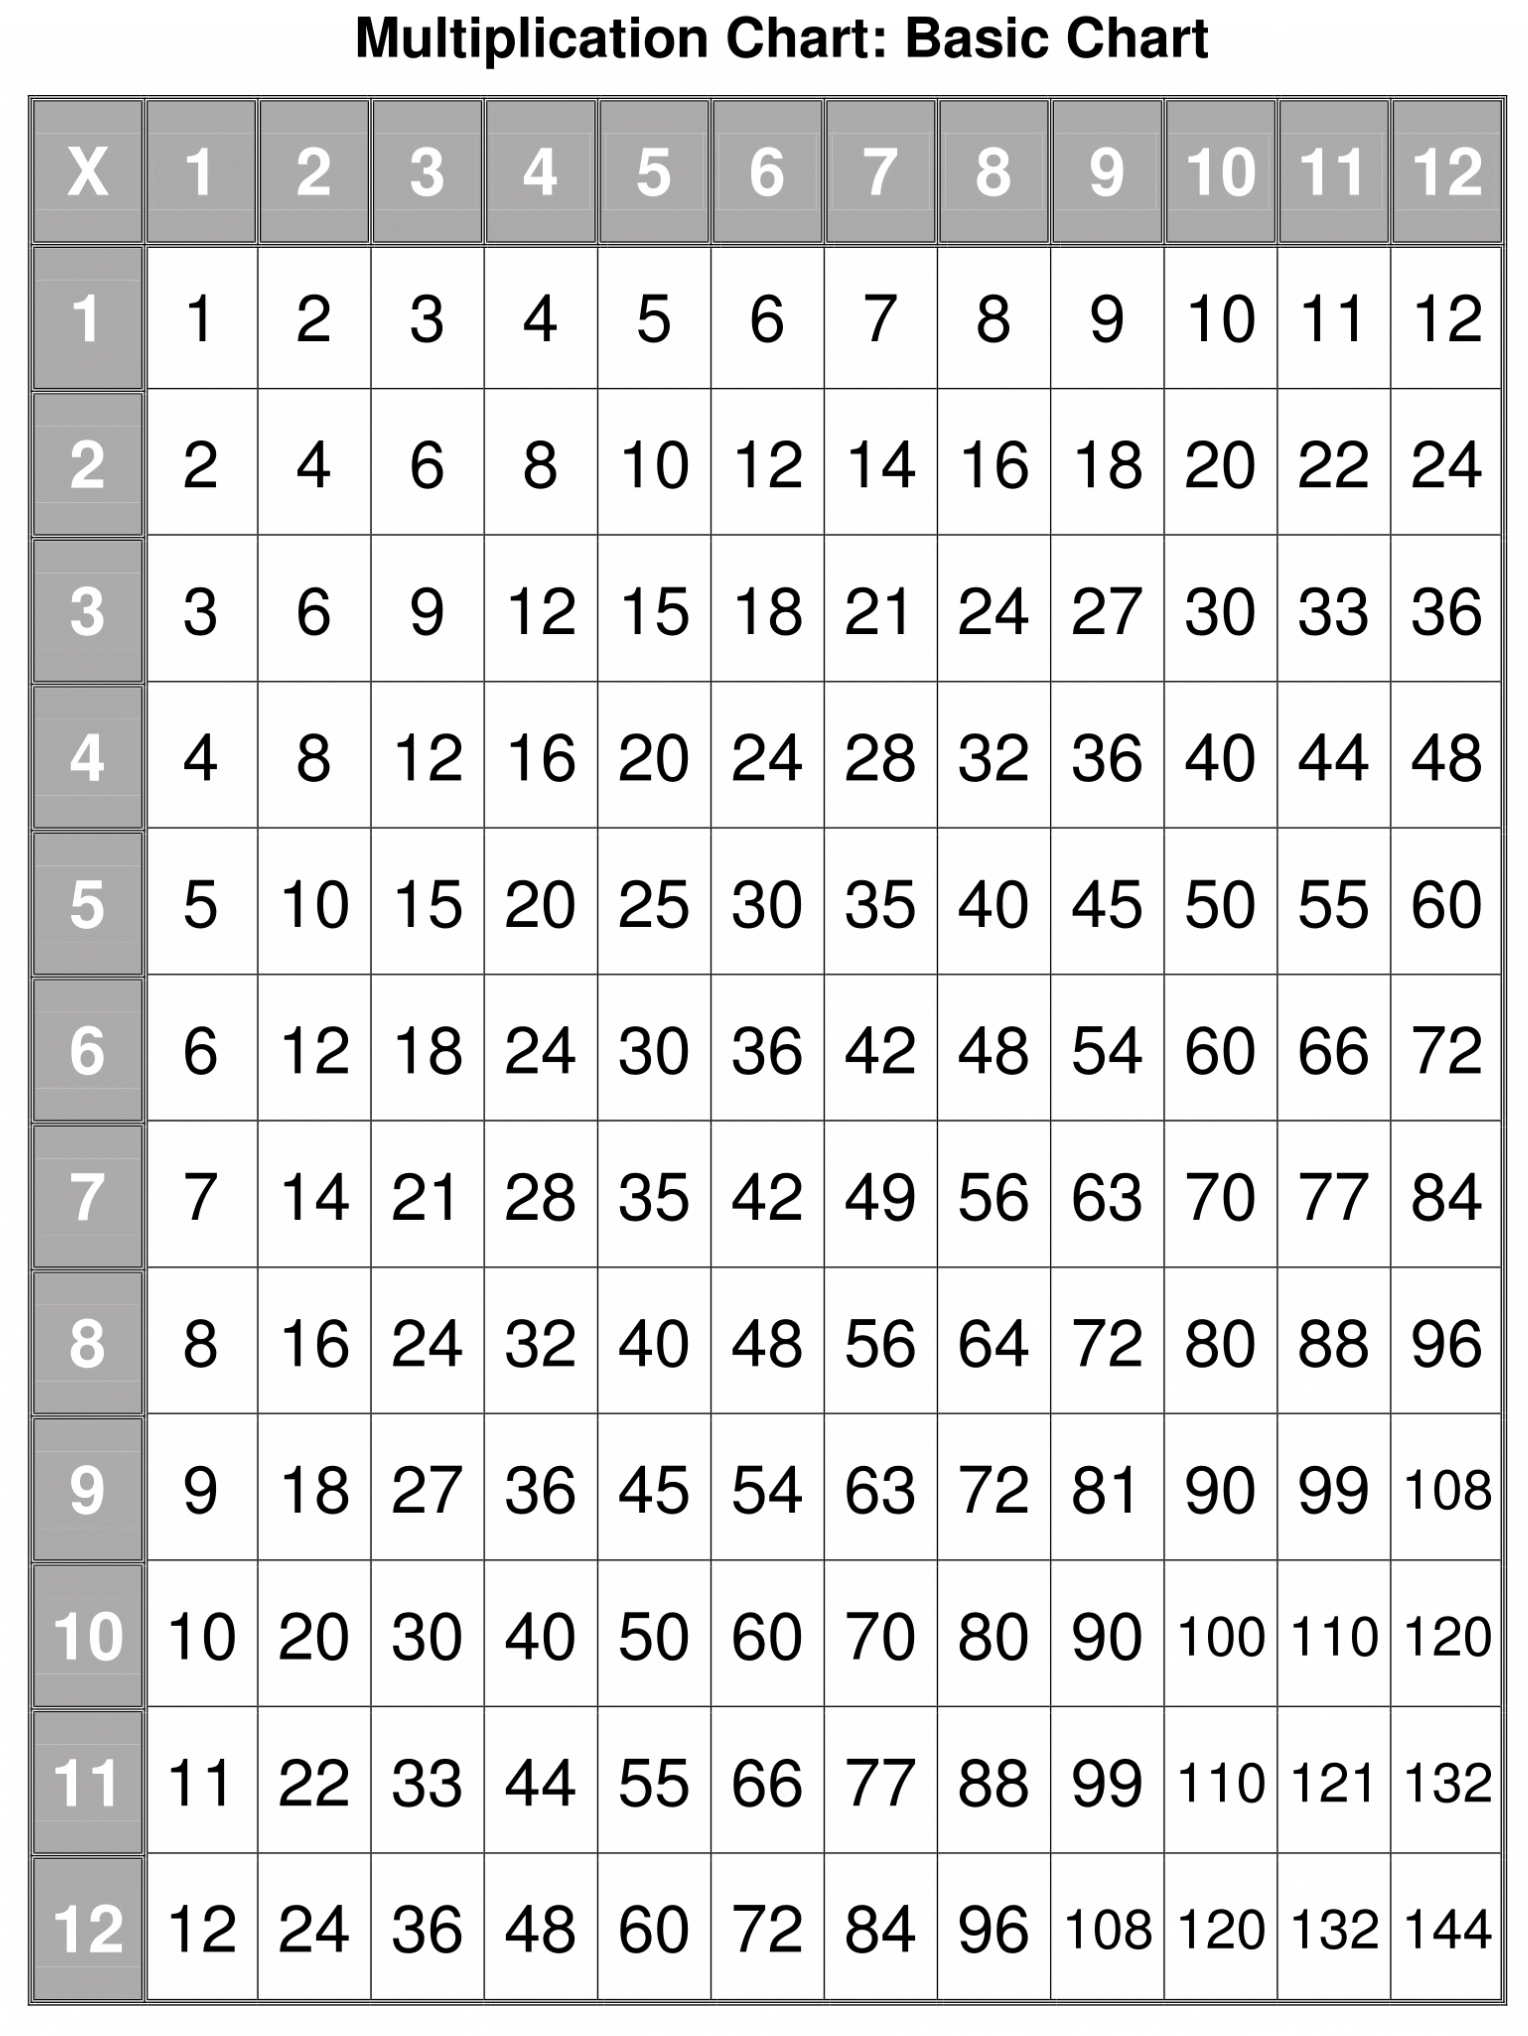 Printable Multiplication Table Pdf   Multiplication Charts regarding Printable Multiplication Chart To 12